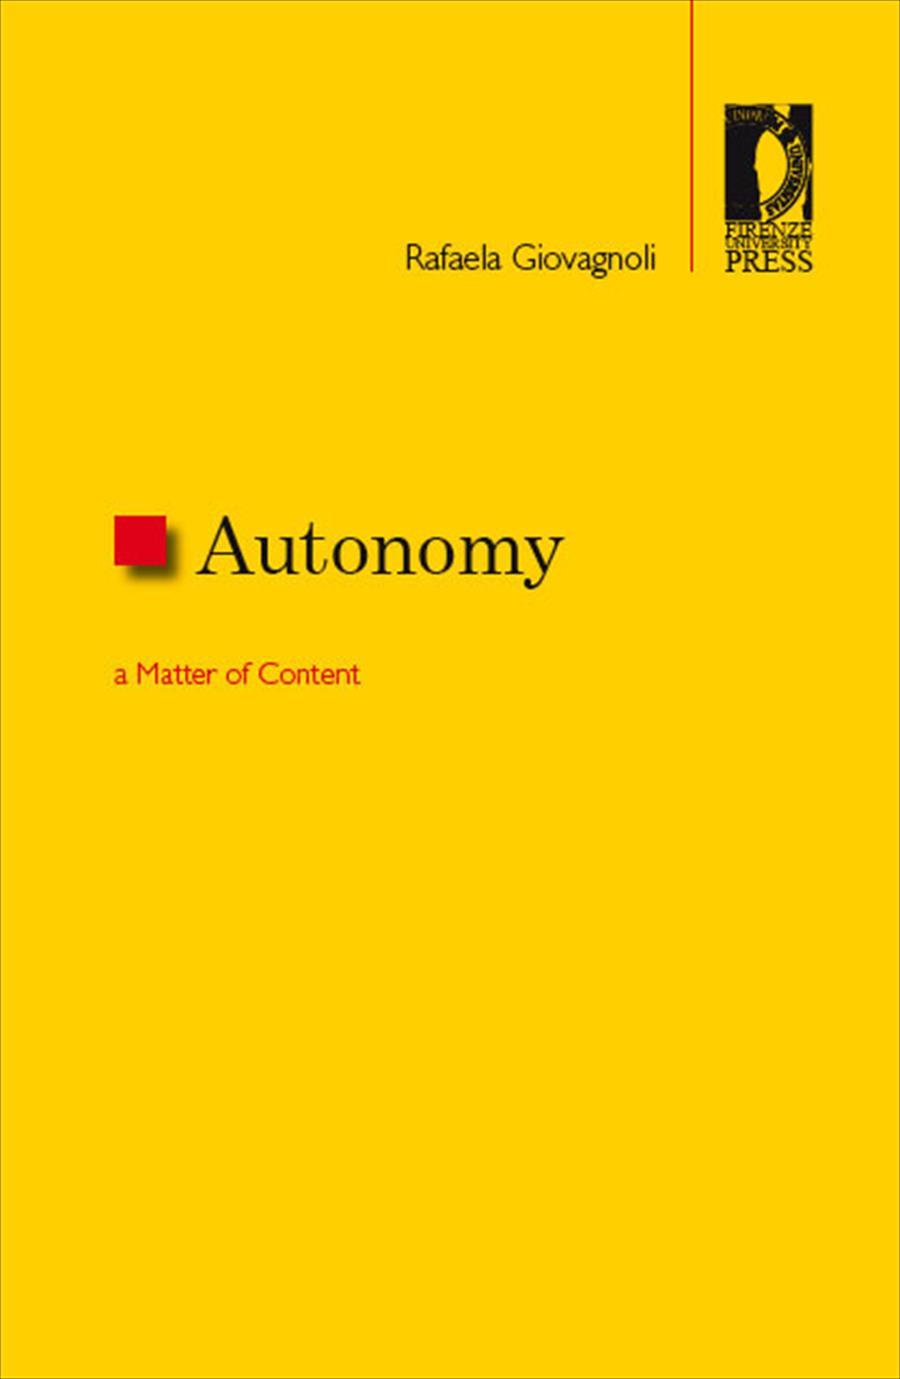 Autonomy: a Matter of Content